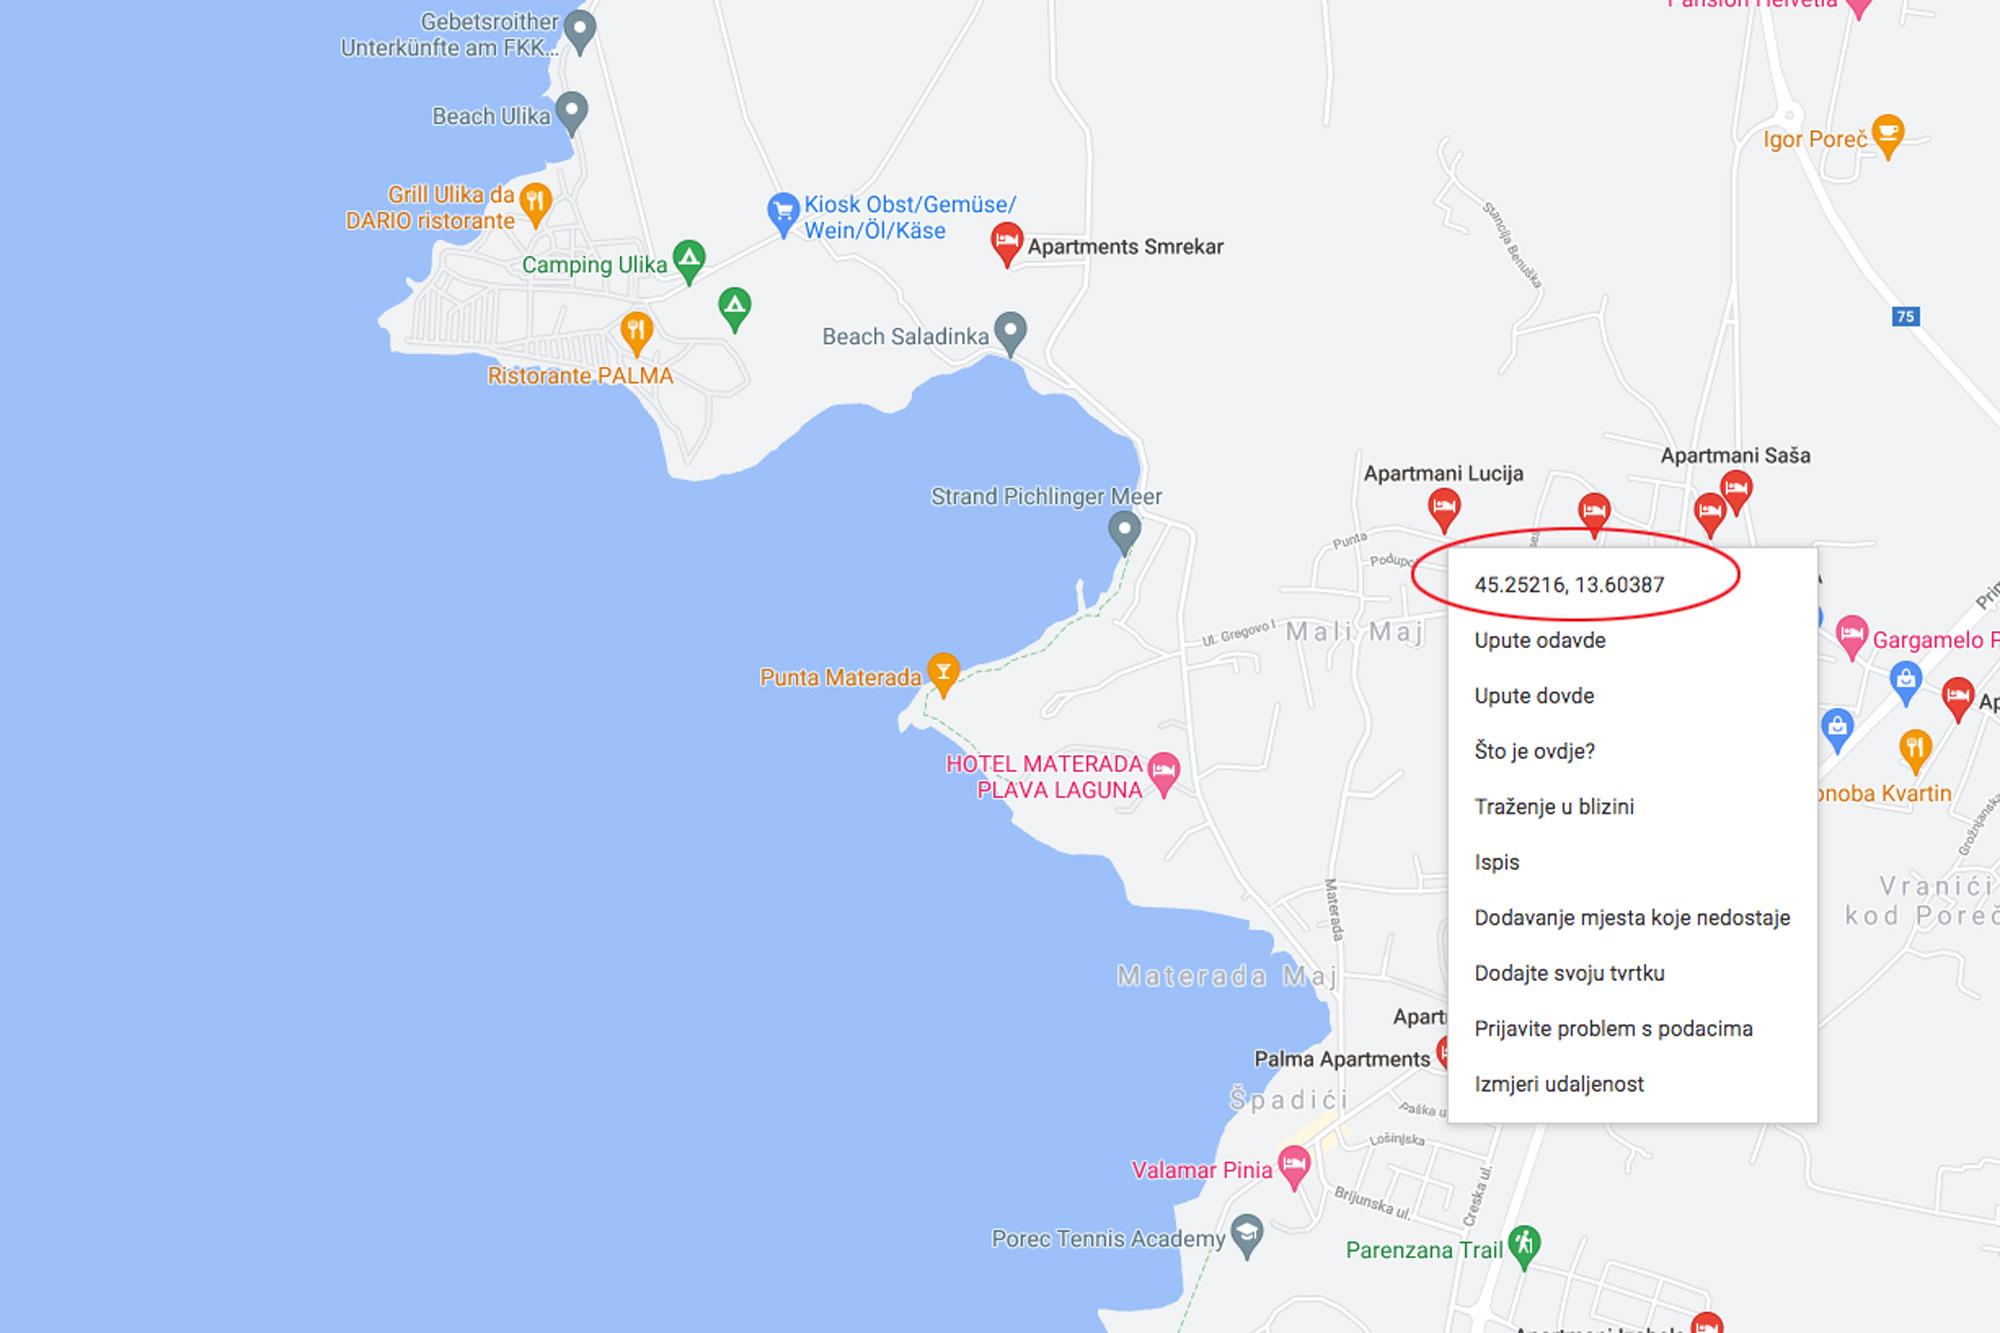 GPS koordinate ggl maps